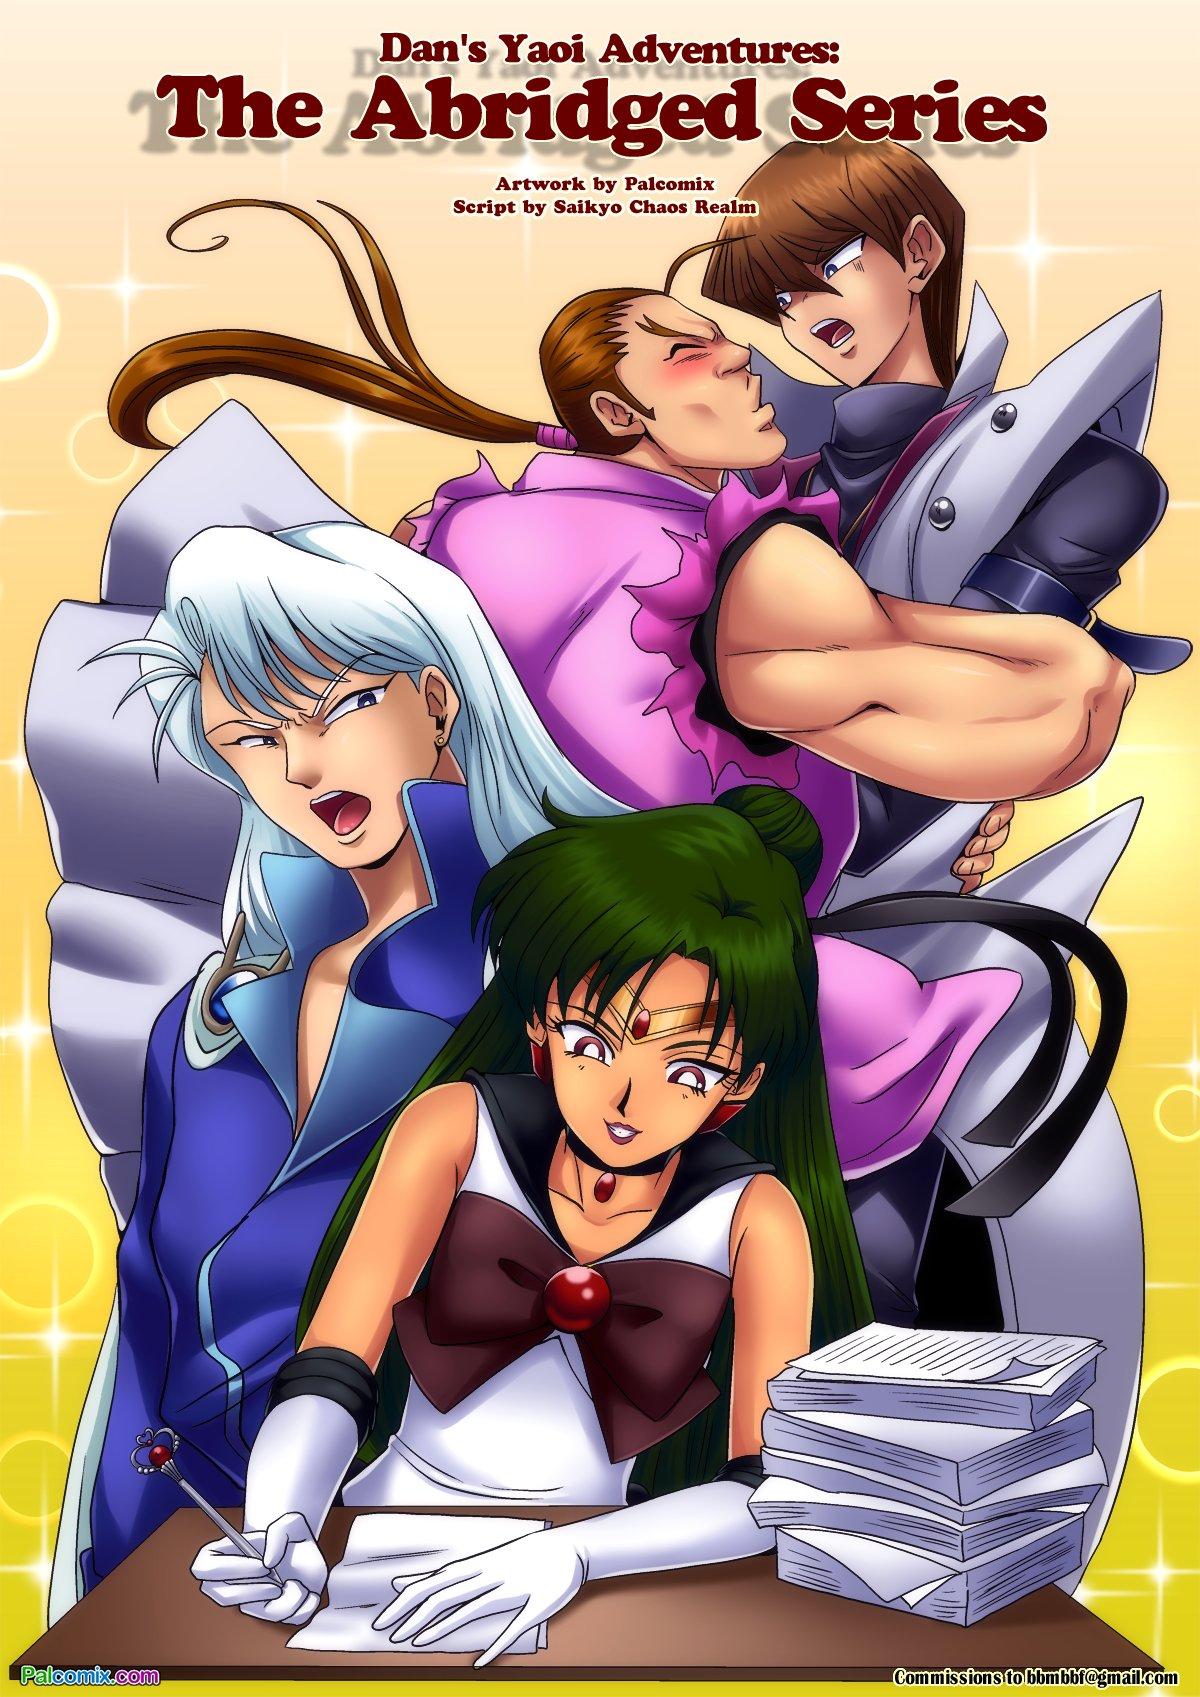 SureFap xxx porno Street Fighter - [Palcomix] - Street Fighter (with Some Sailor Moon) - Vega vs Chun Li #3 - Dan's Yaoi Adventures: The Abridged Series